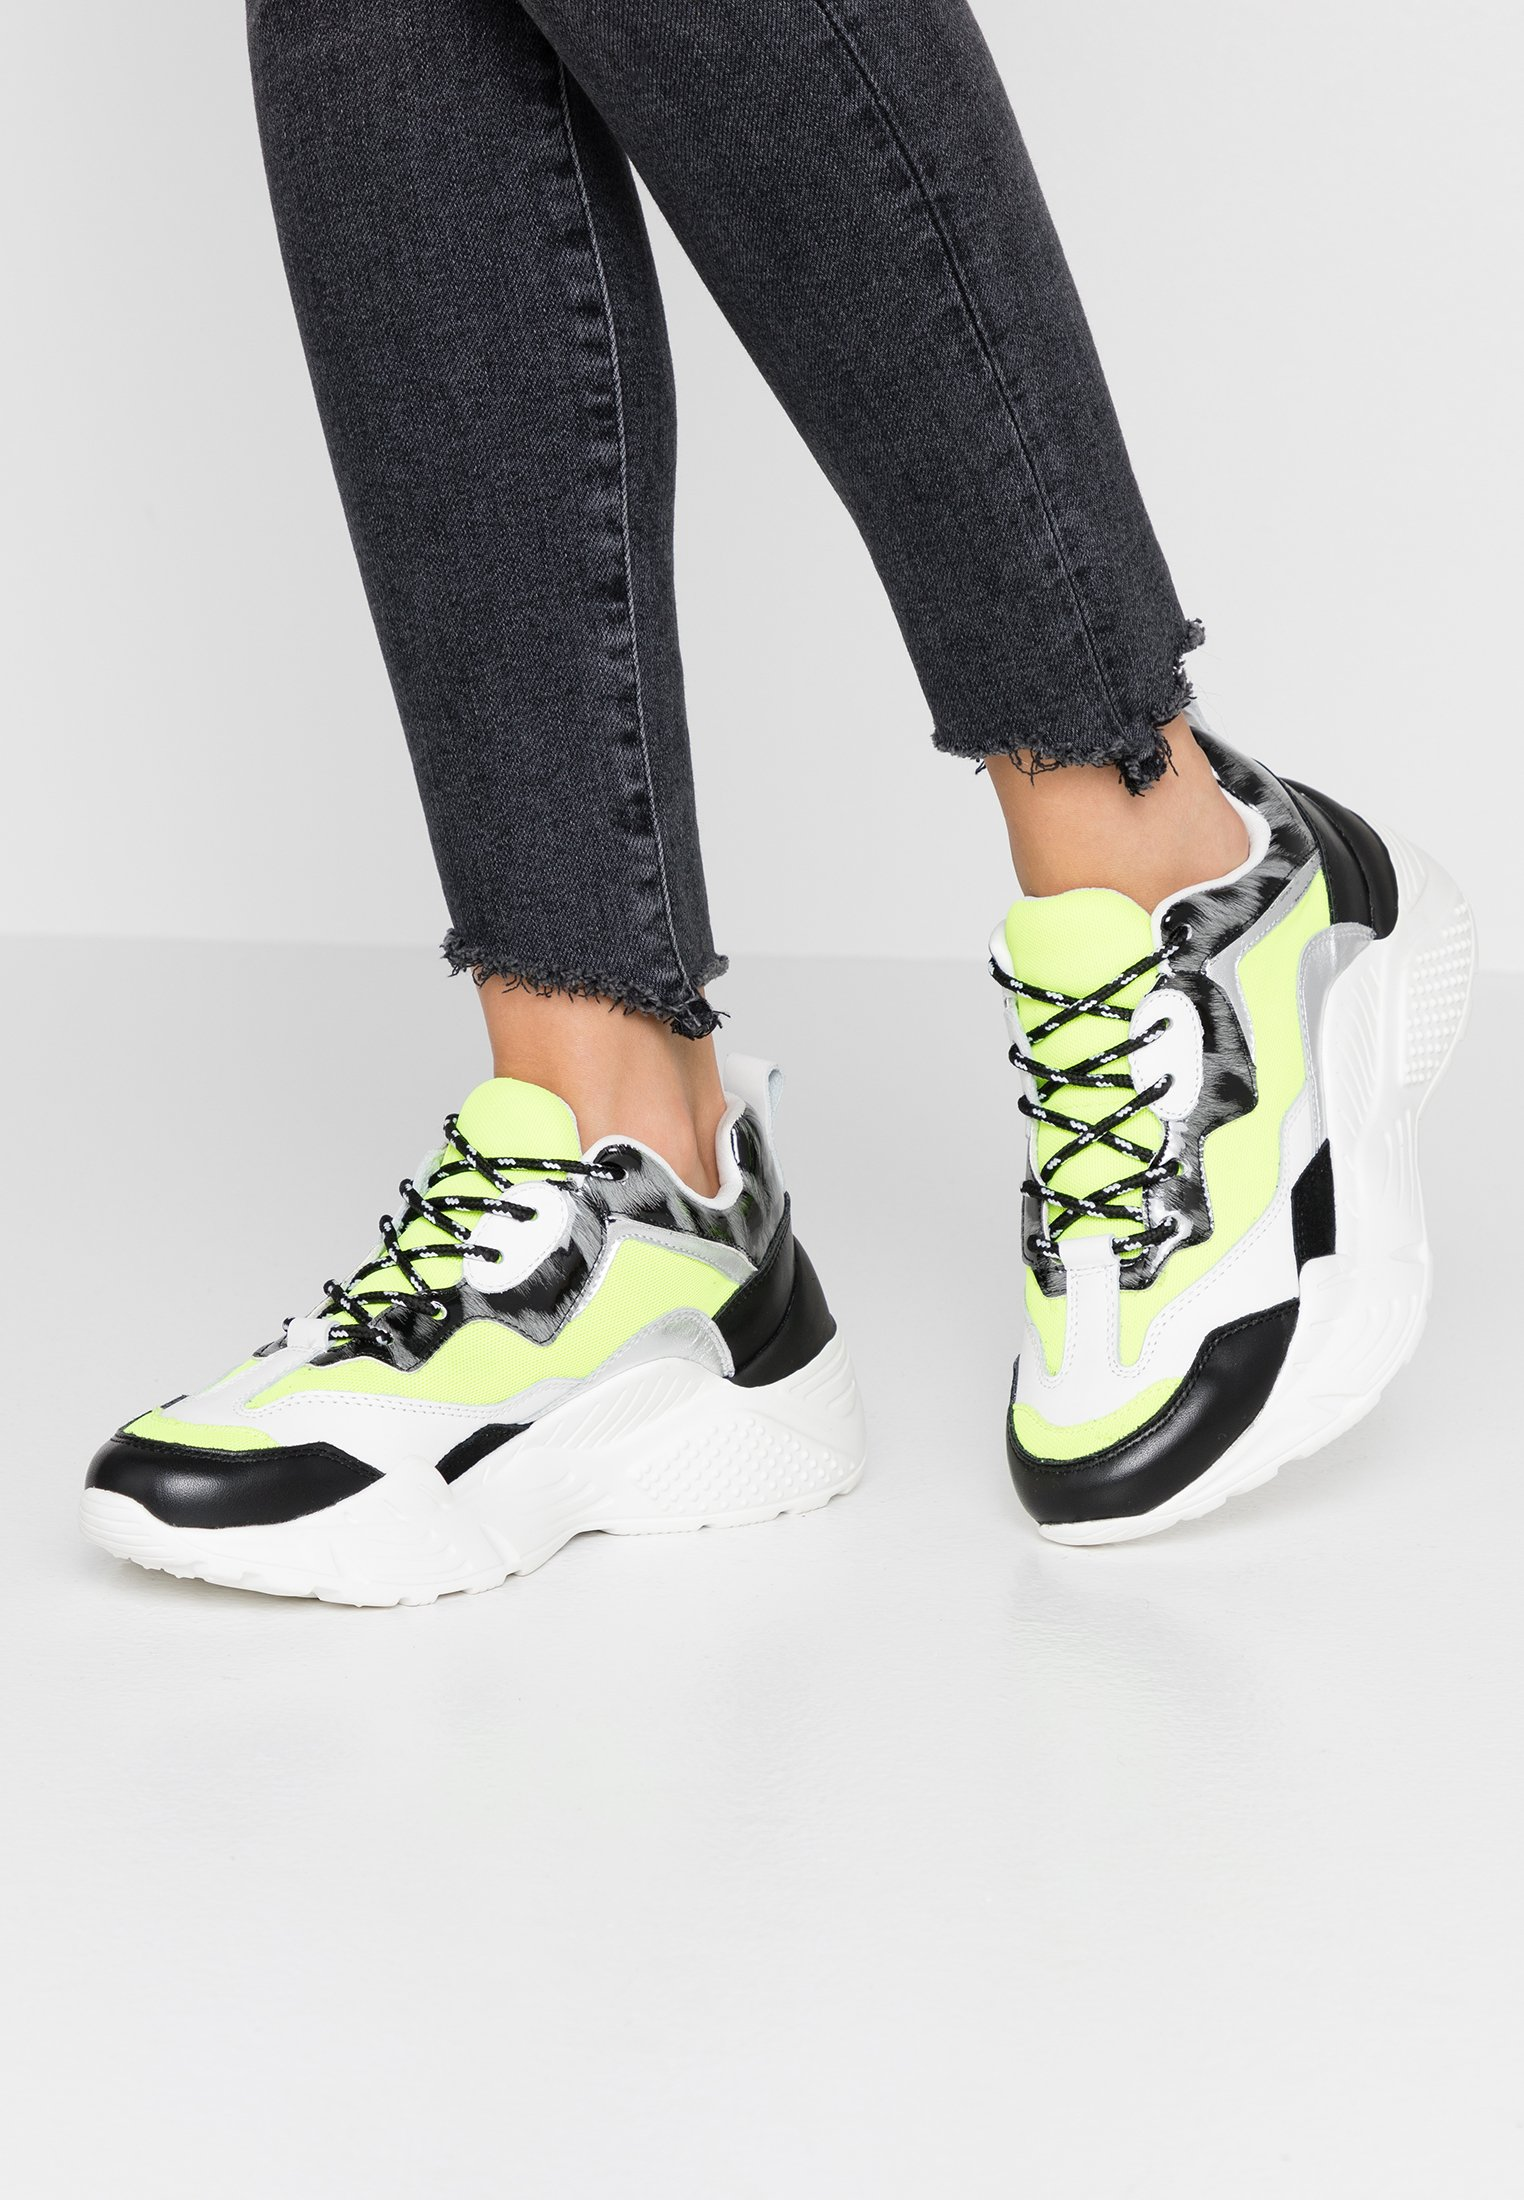 Steve Madden ANTONIA - Sneakers basse neon yellow